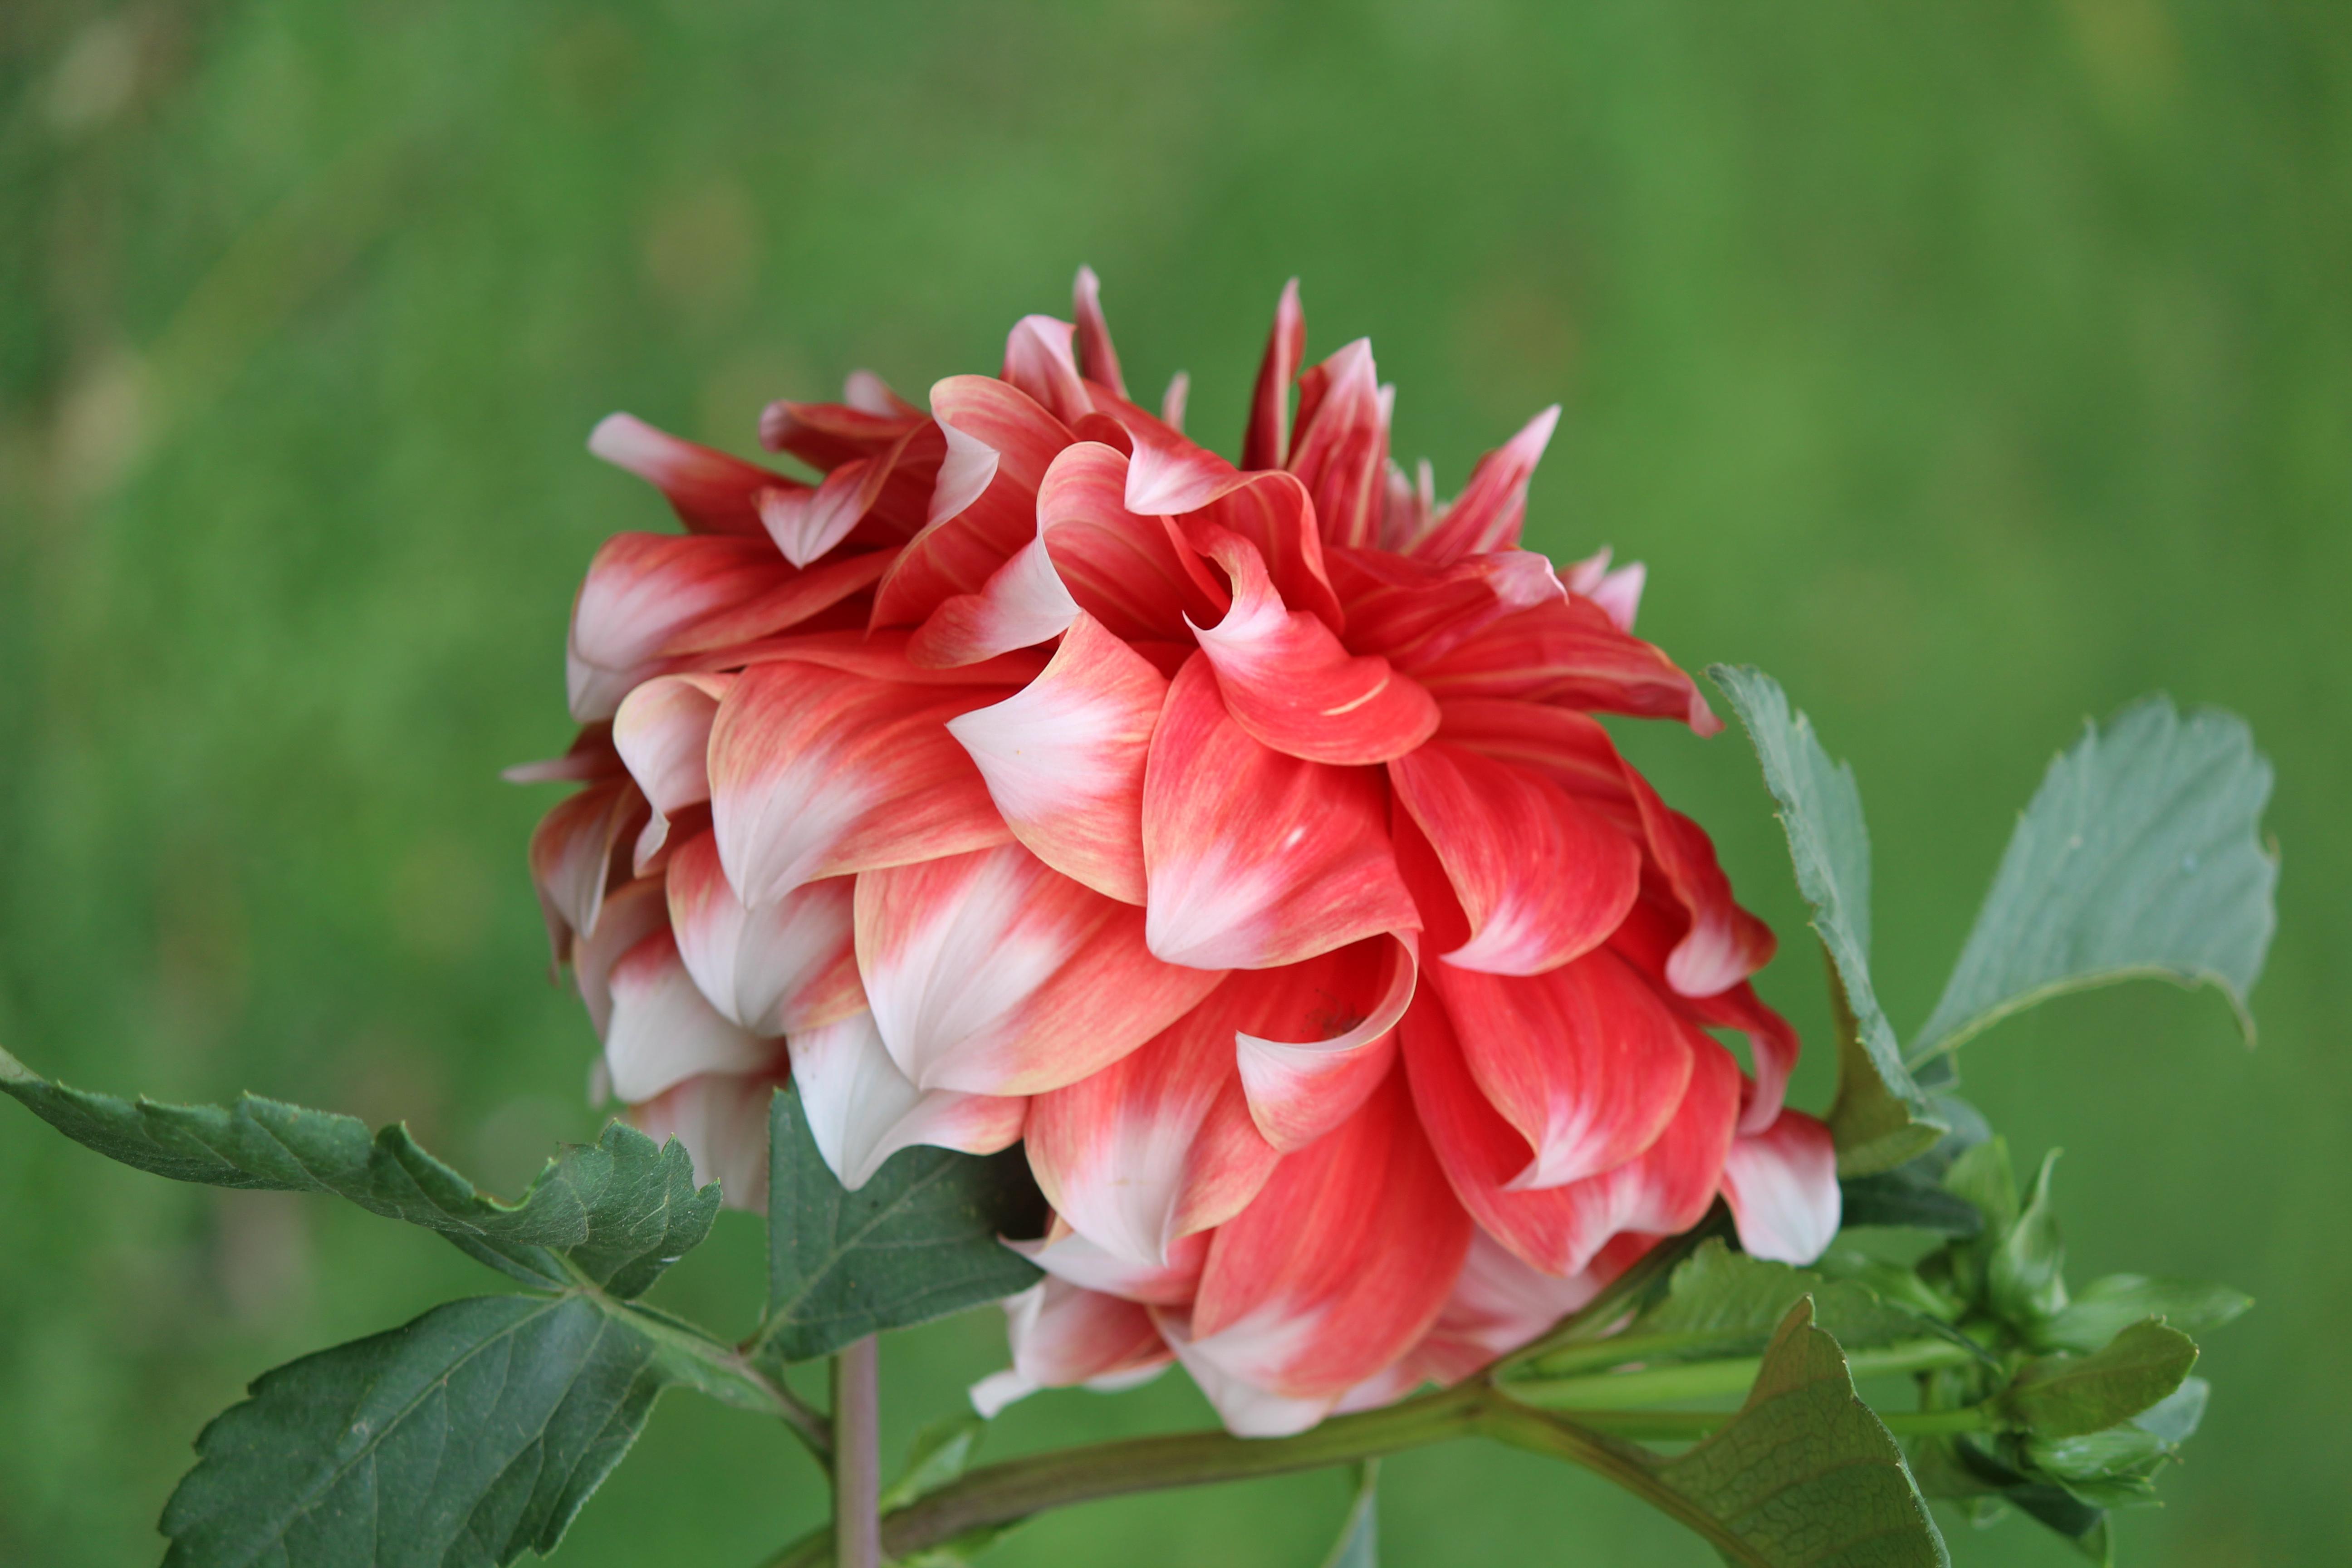 Filered dahlia flower side viewg wikimedia commons filered dahlia flower side viewg izmirmasajfo